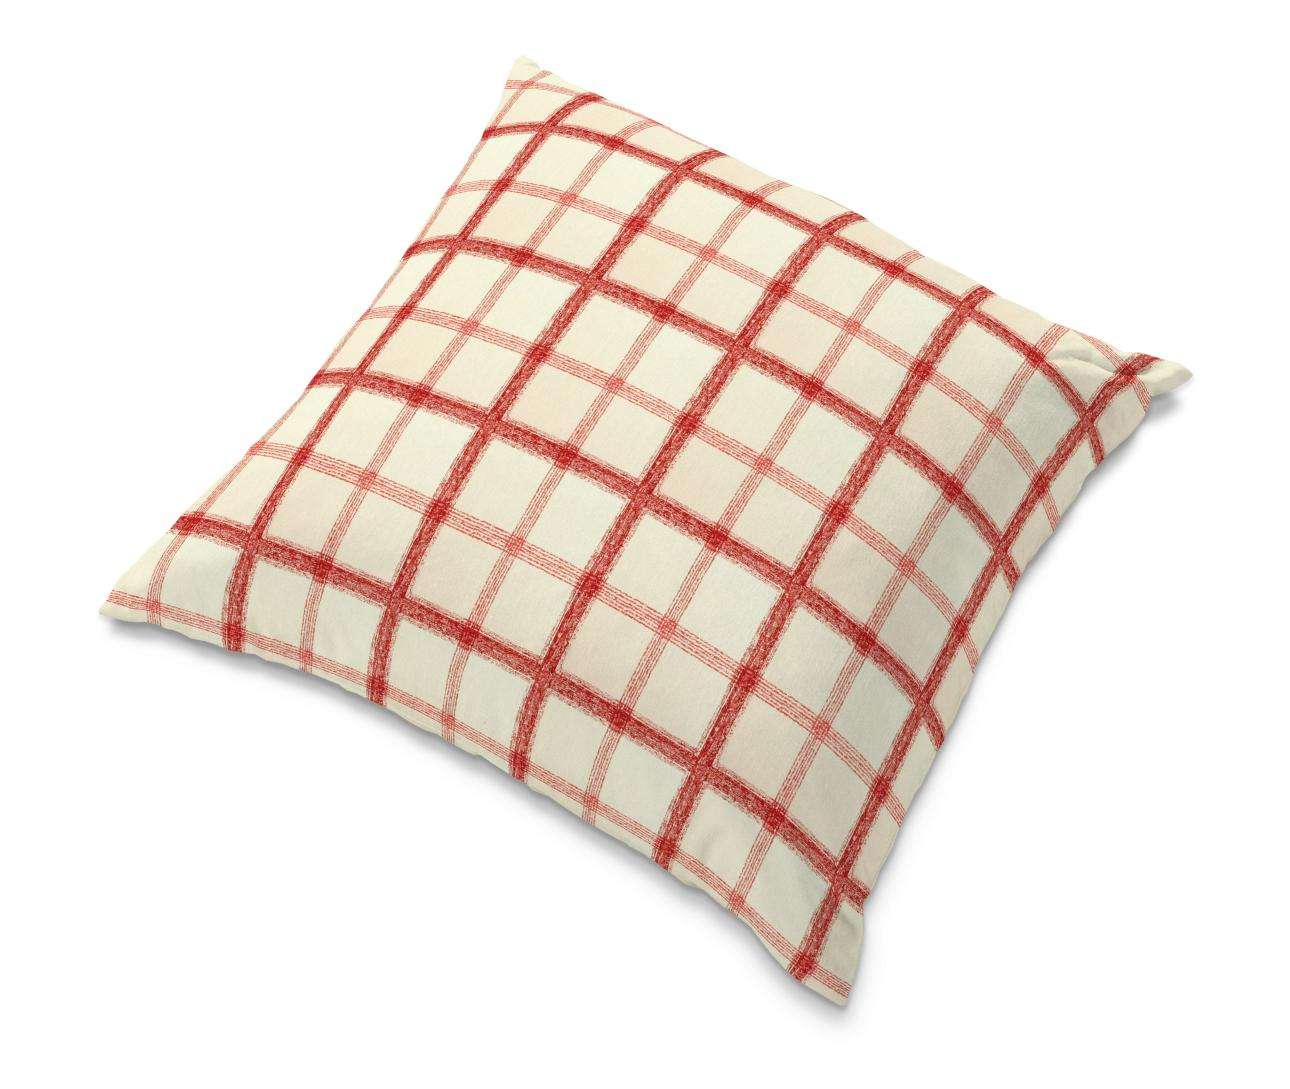 Tomelilla cushion cover 55 x 55 cm (22 x 22 inch) in collection Avinon, fabric: 131-15